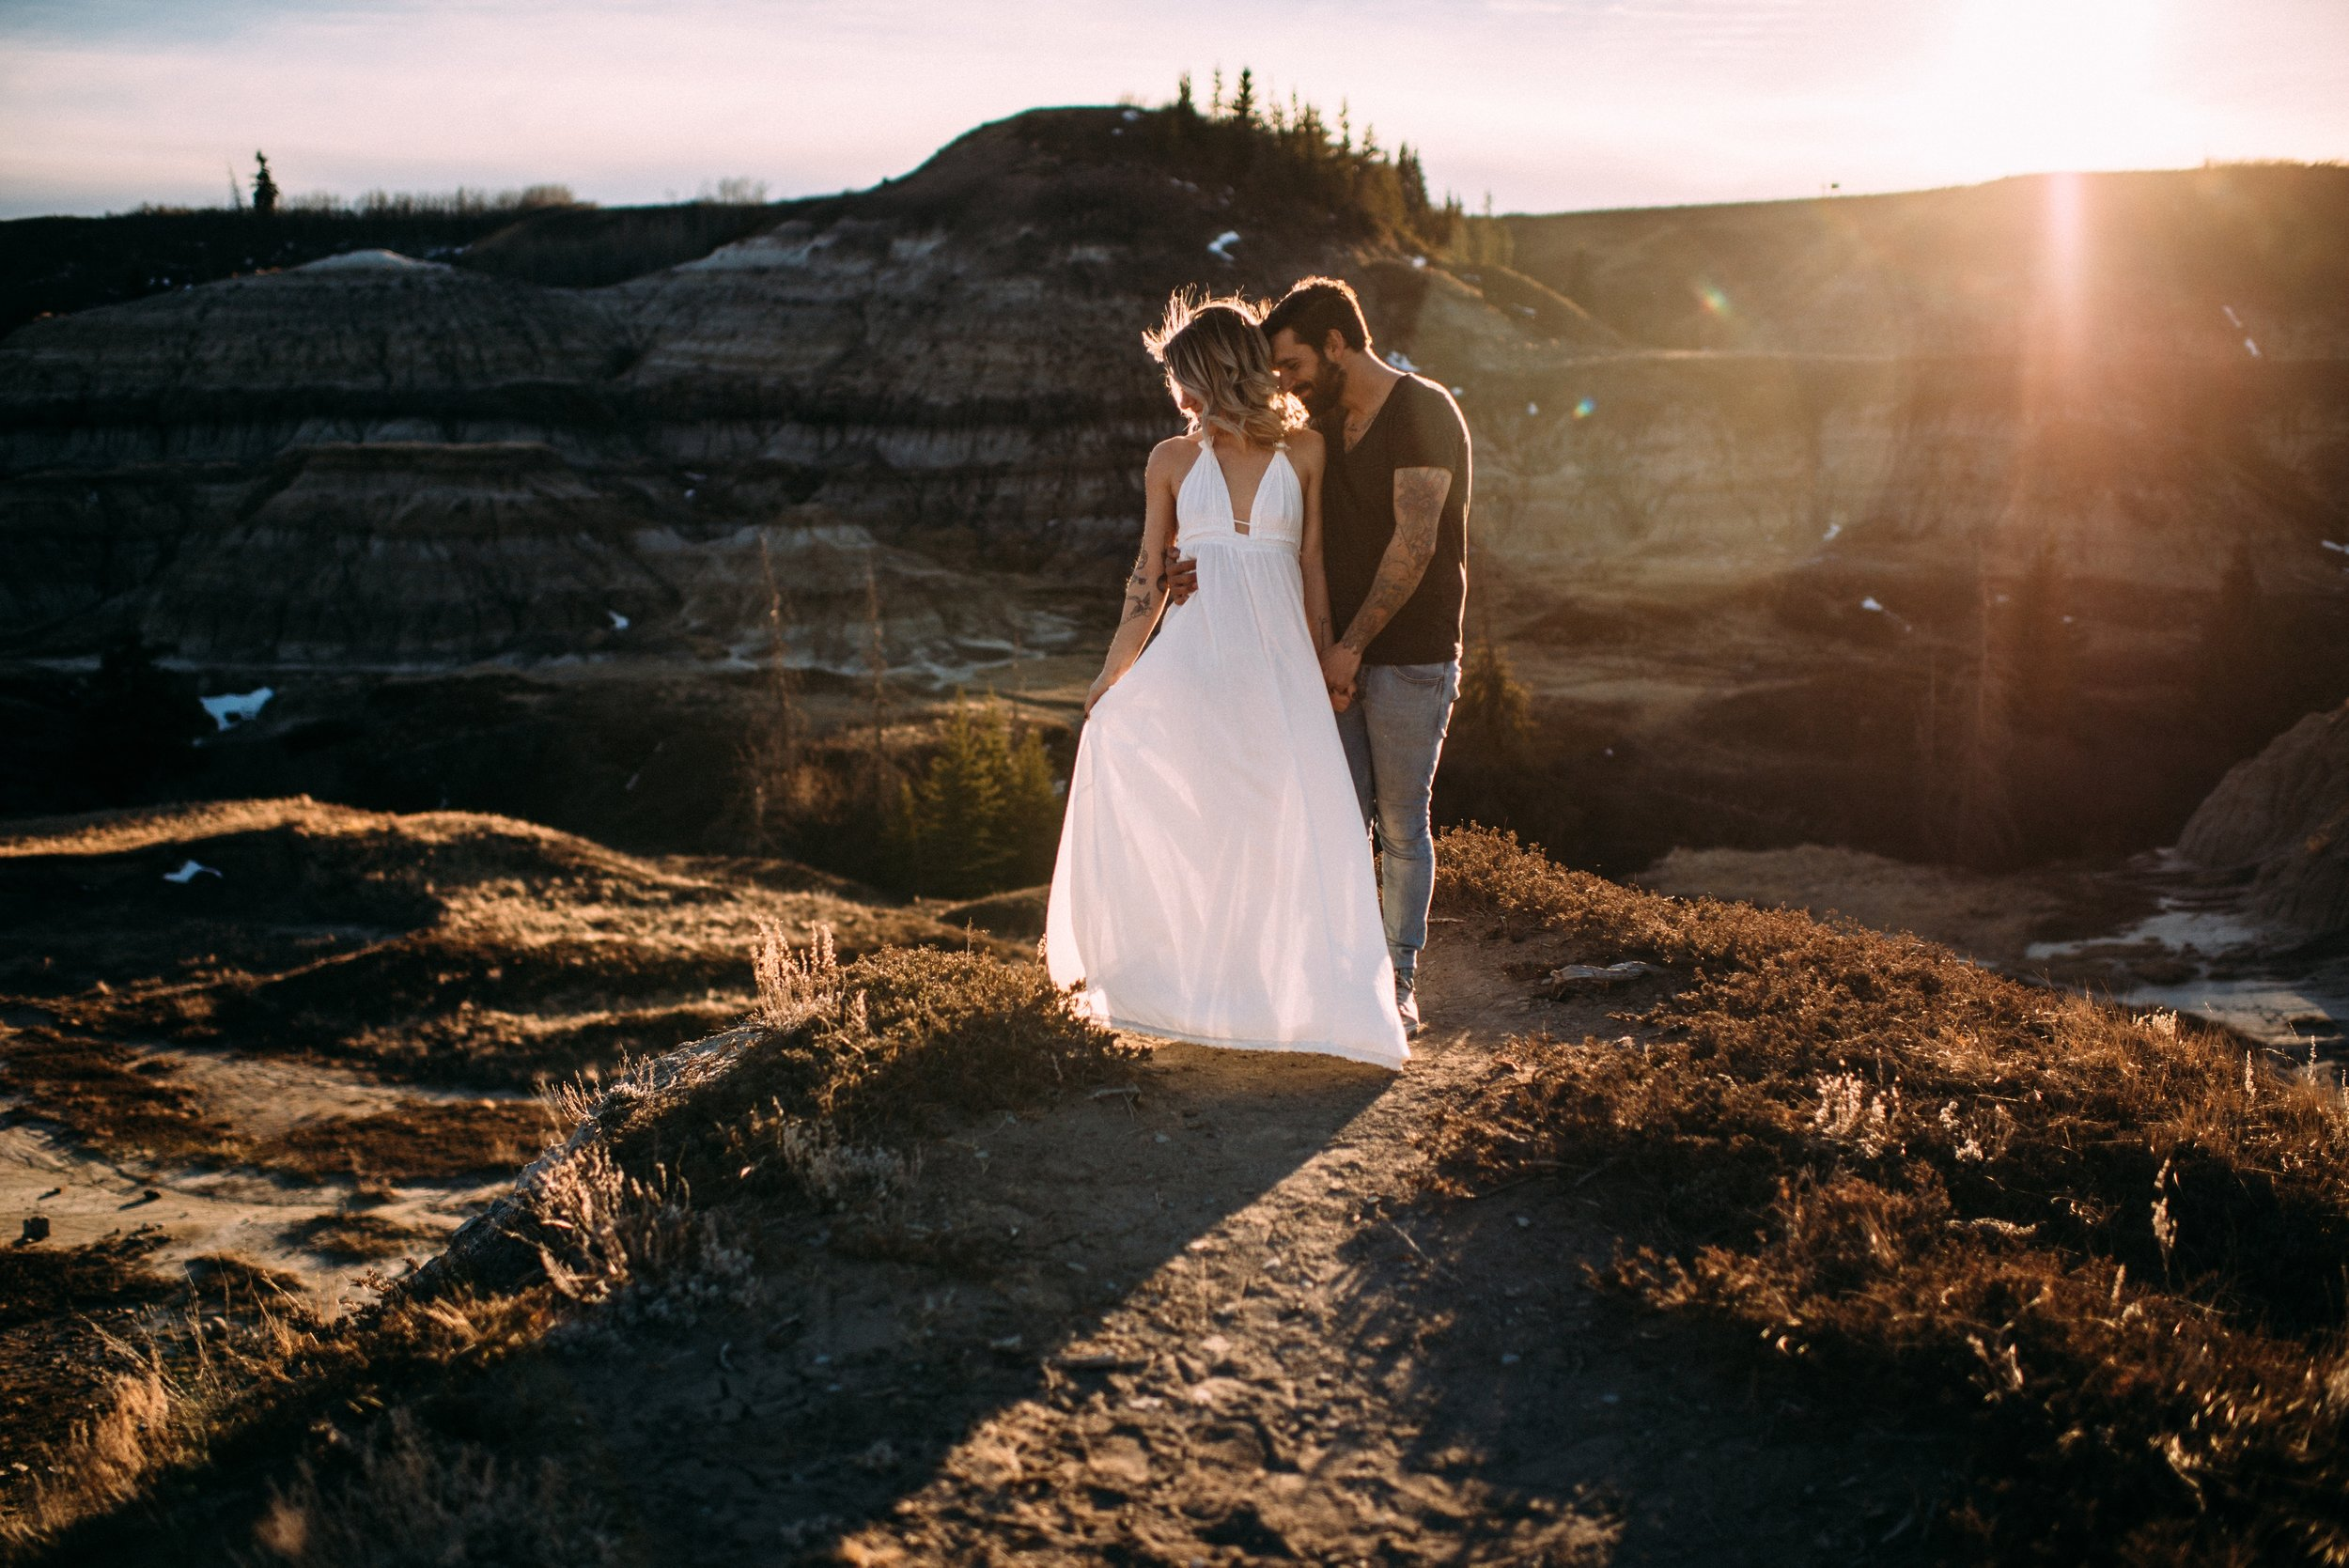 kaihla_tonai_intimate_wedding_elopement_photographer_3598